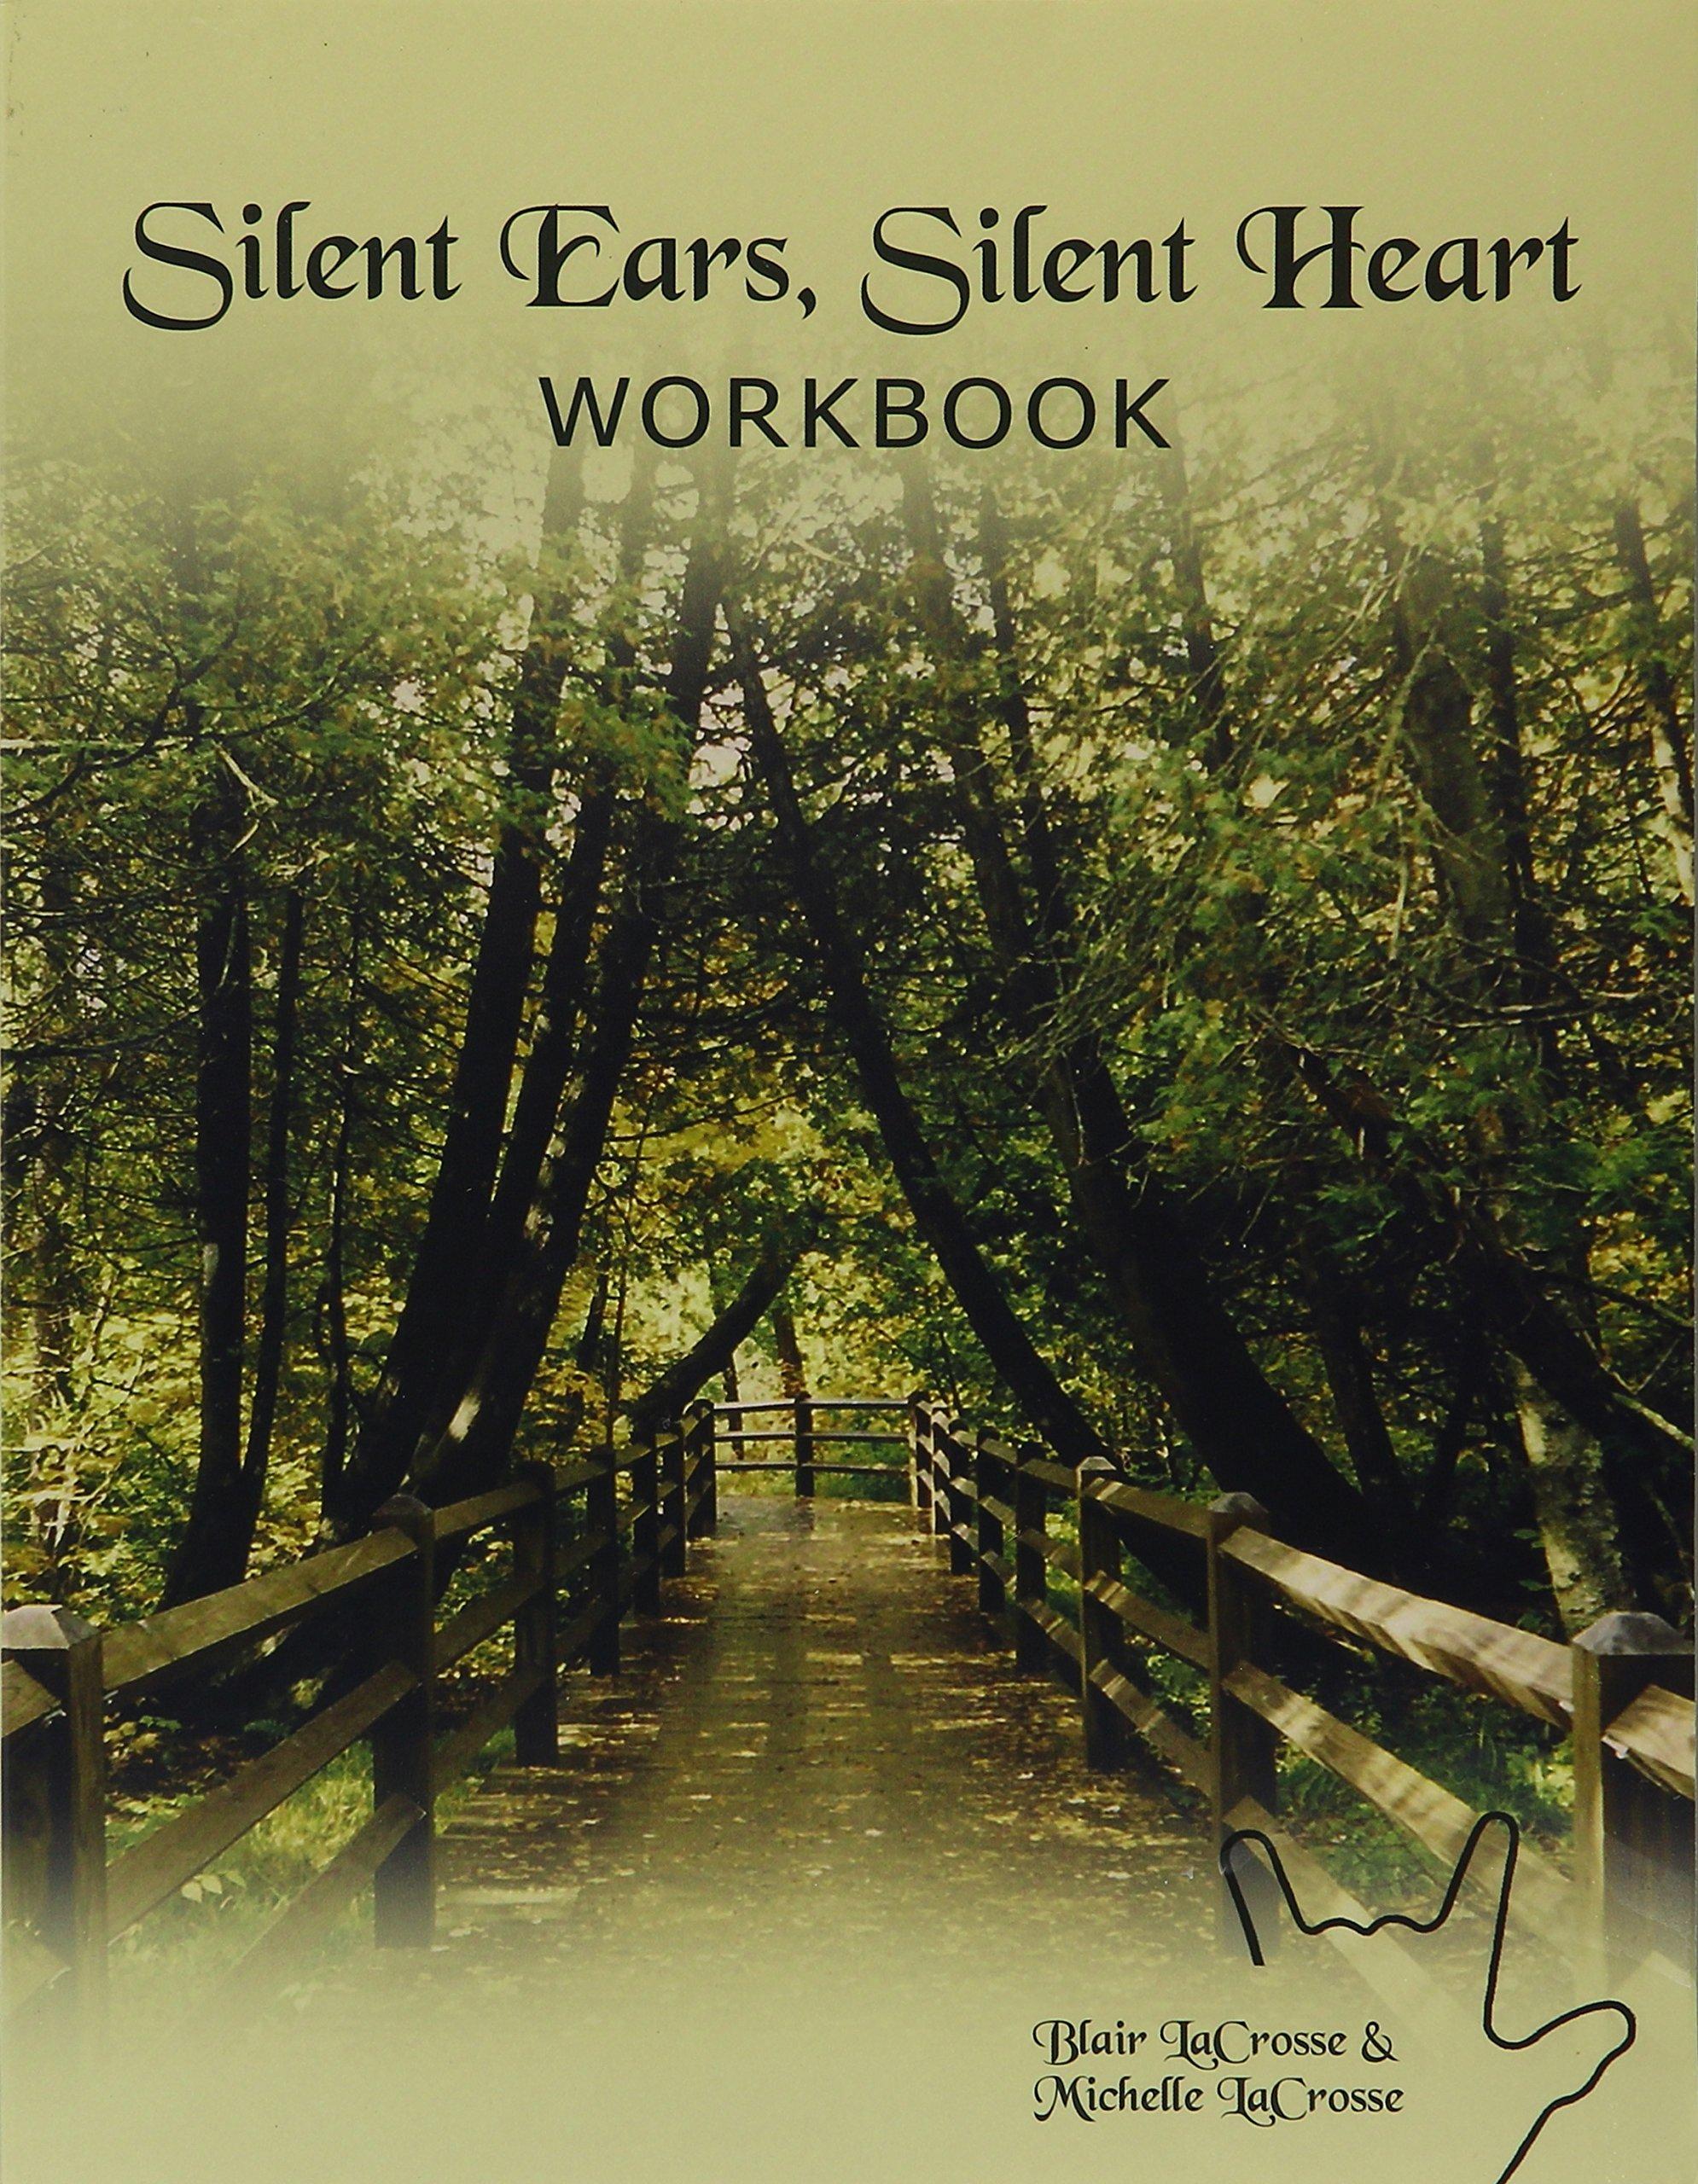 Silent ears silent heart workbook blair and michelle lacrosse silent ears silent heart workbook blair and michelle lacrosse 9780974011110 amazon books fandeluxe Choice Image